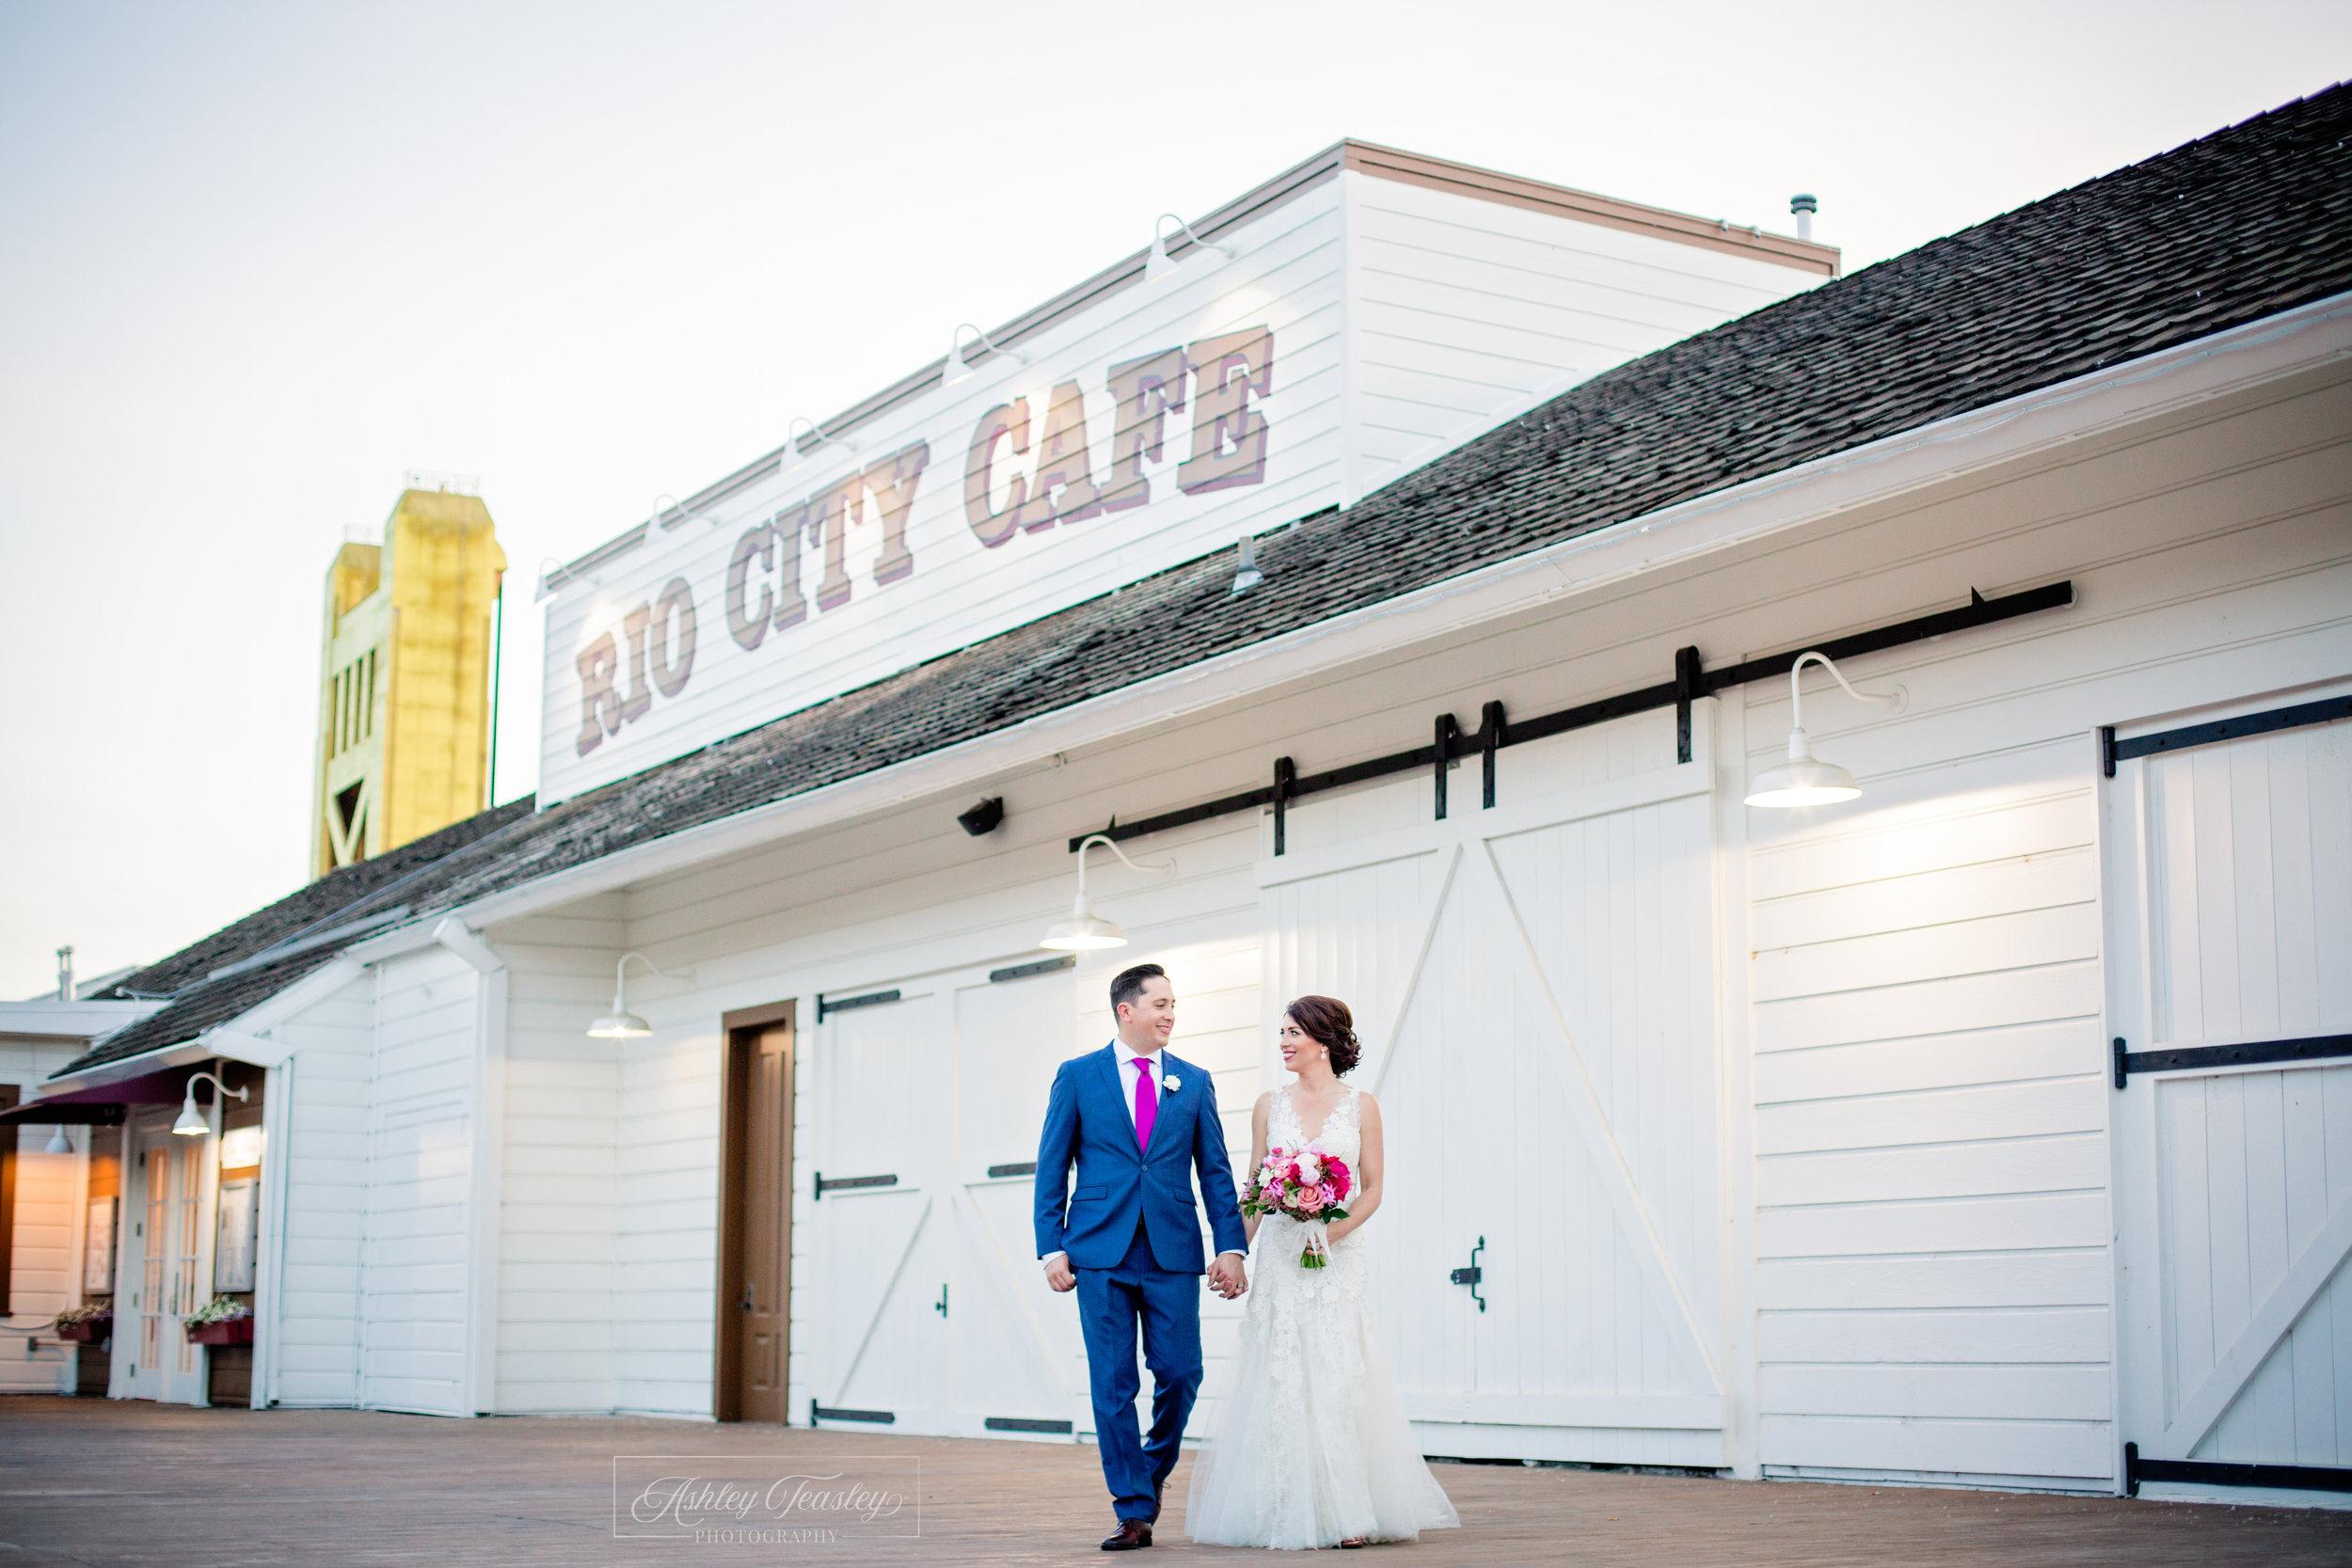 Tarrah & Francisco - The Kimpton Sawyer Hotel - The Firehouse Old Sac - Sacramento Wedding Photographer - Ashley Teasley Photography (48 of 118).jpg